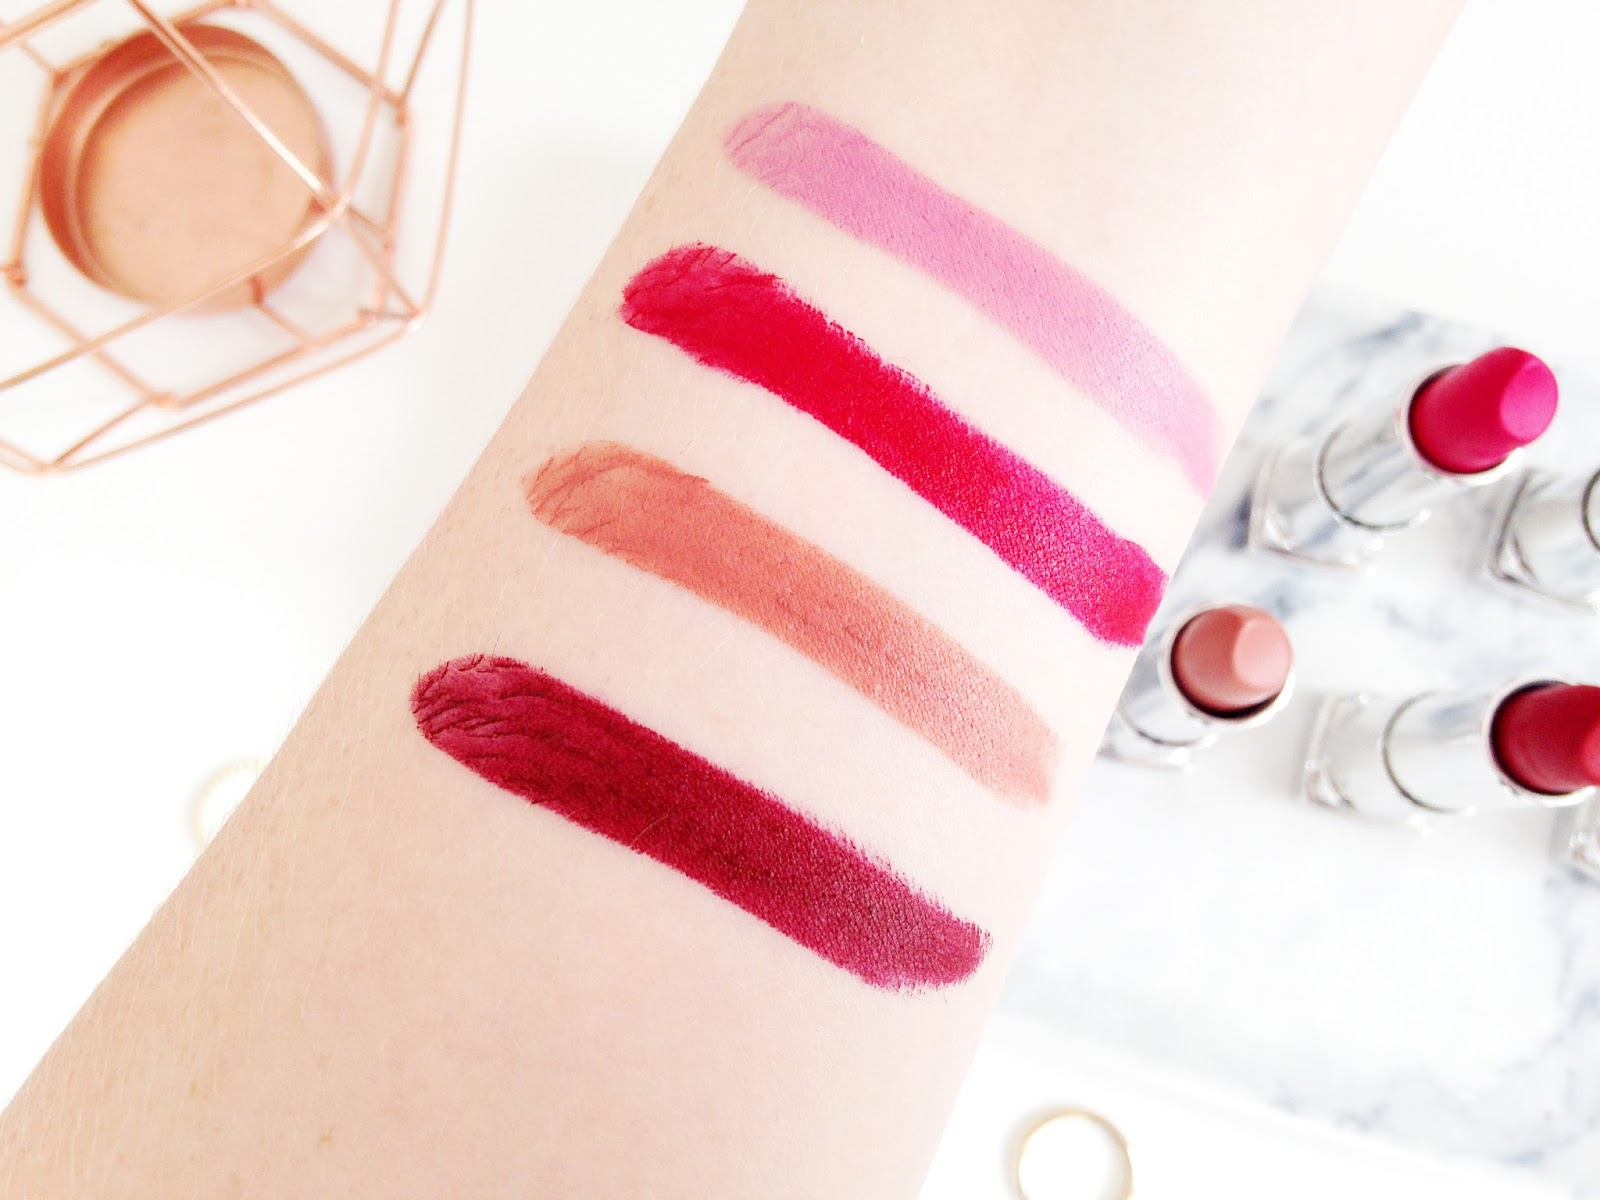 Maybelline Creamy Mattes Lipstick Swatches